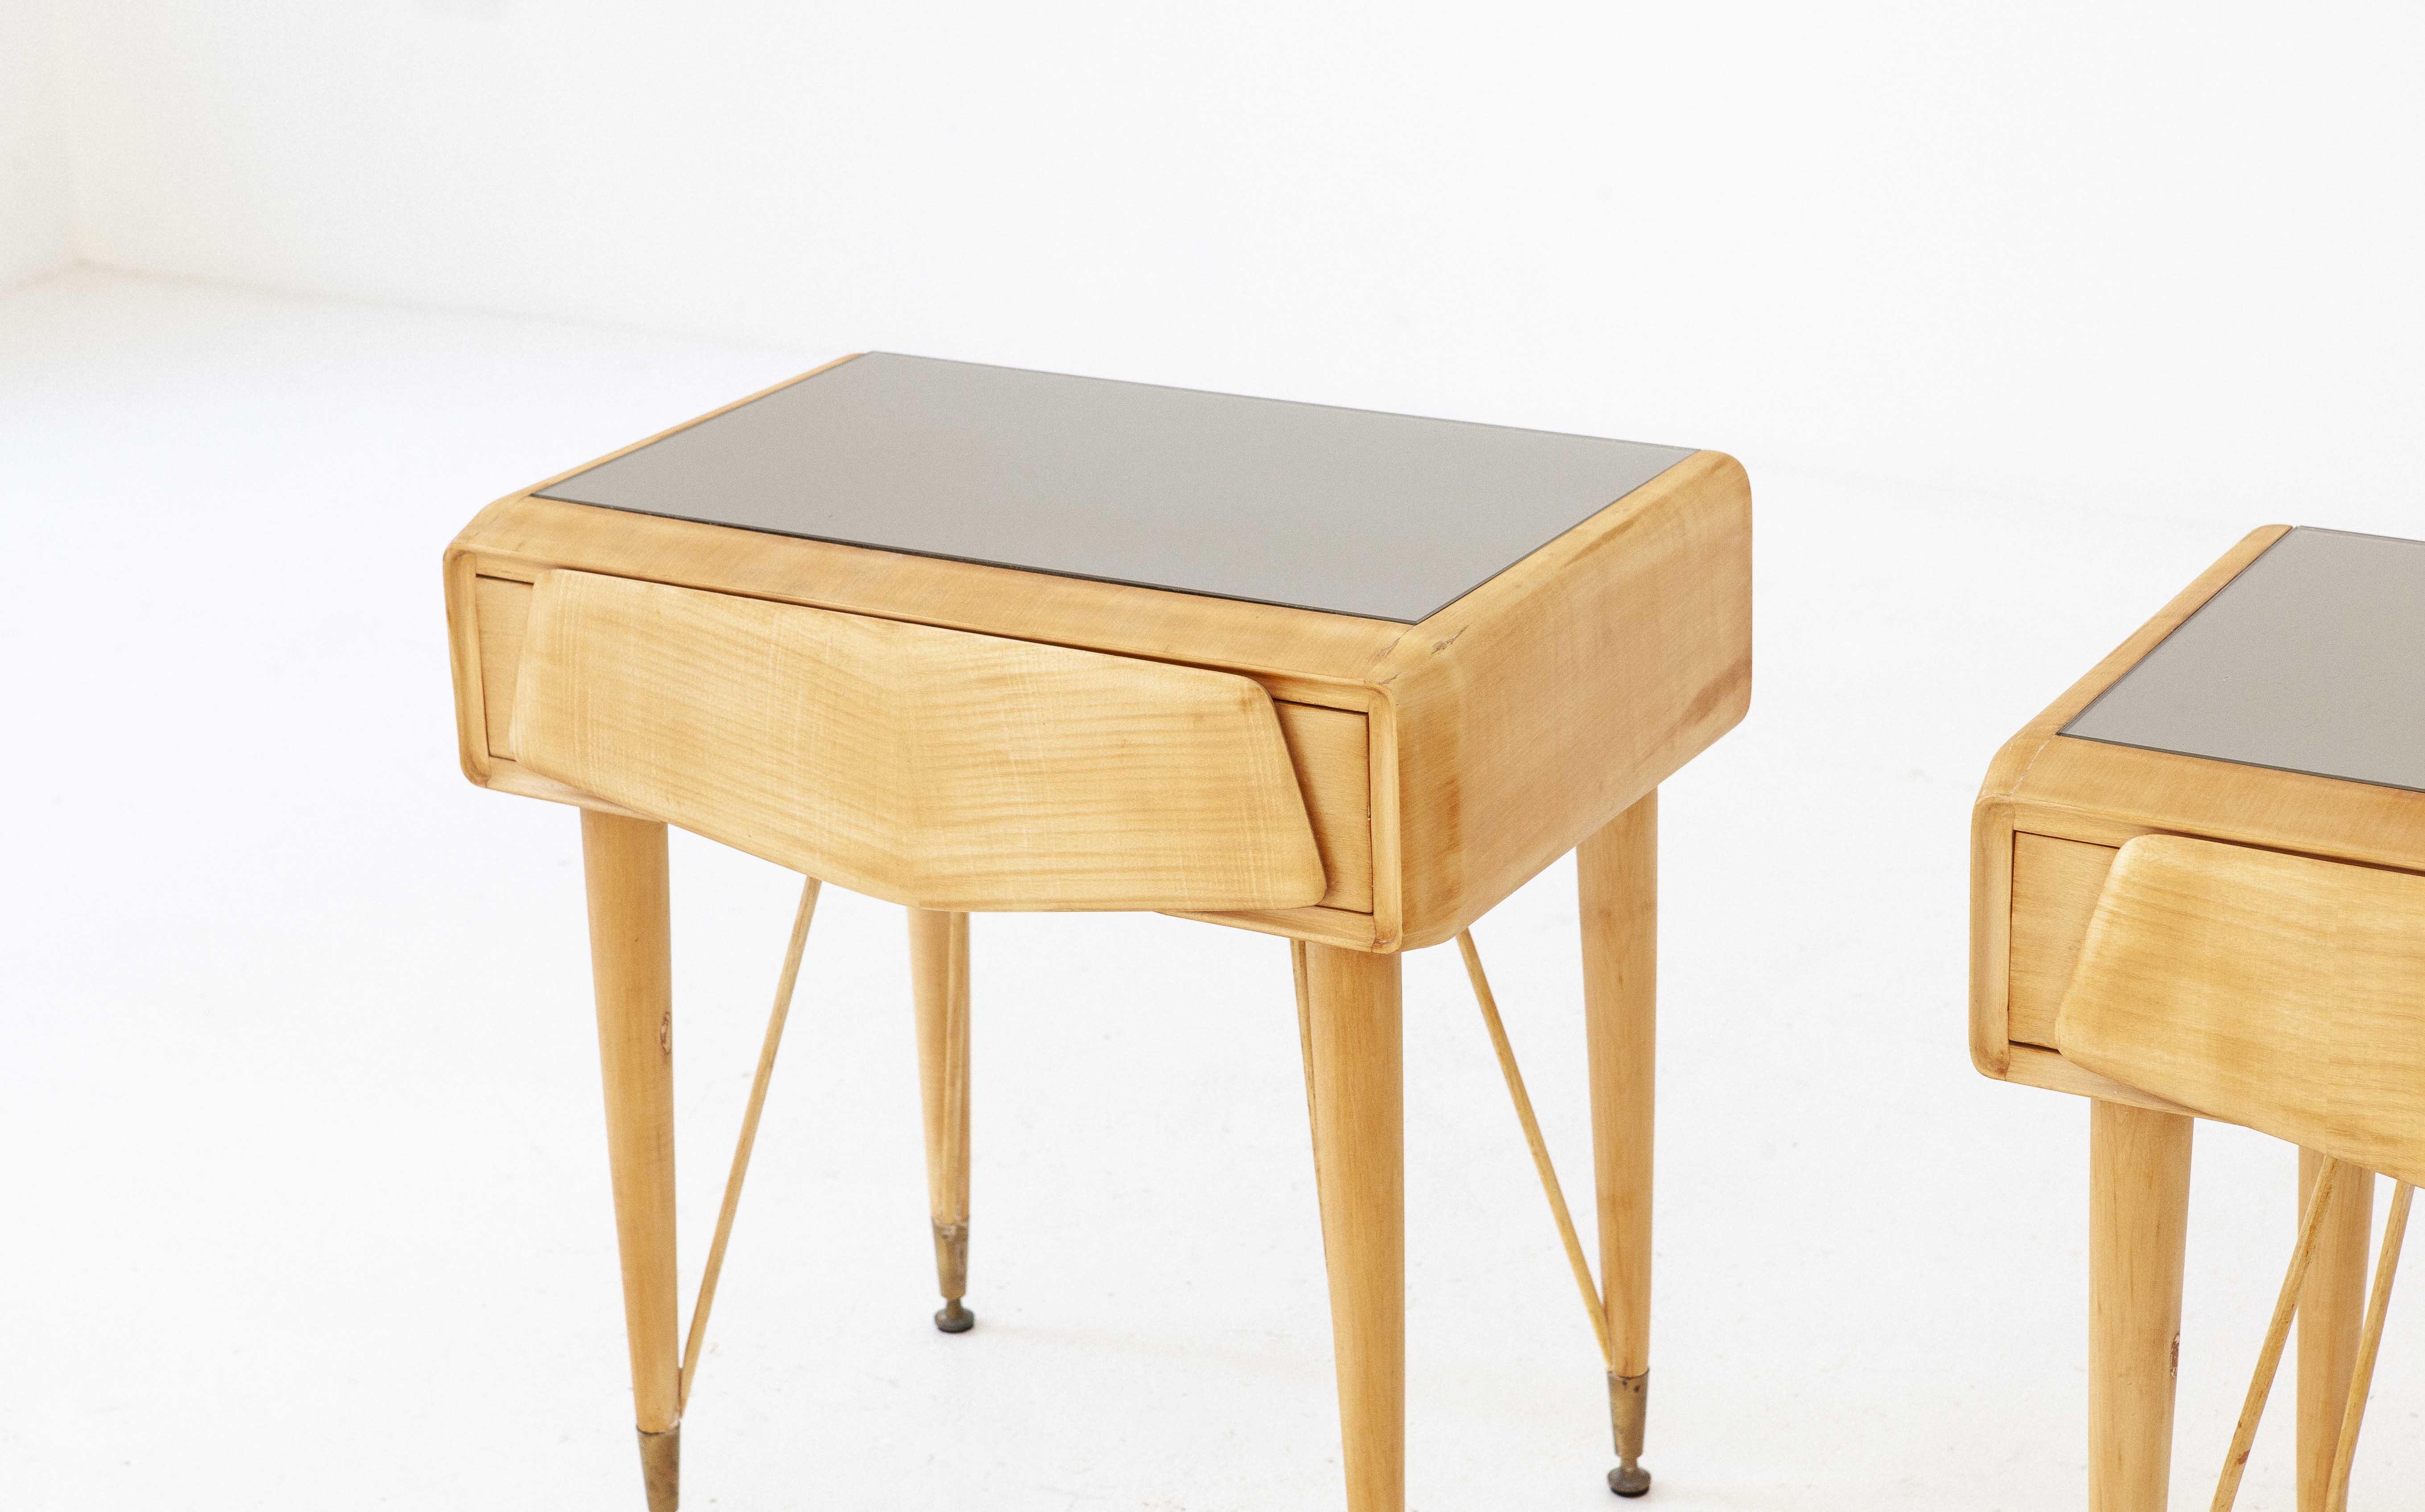 italian-mable-wood-glass-brass-bedside-tables-4-BT77